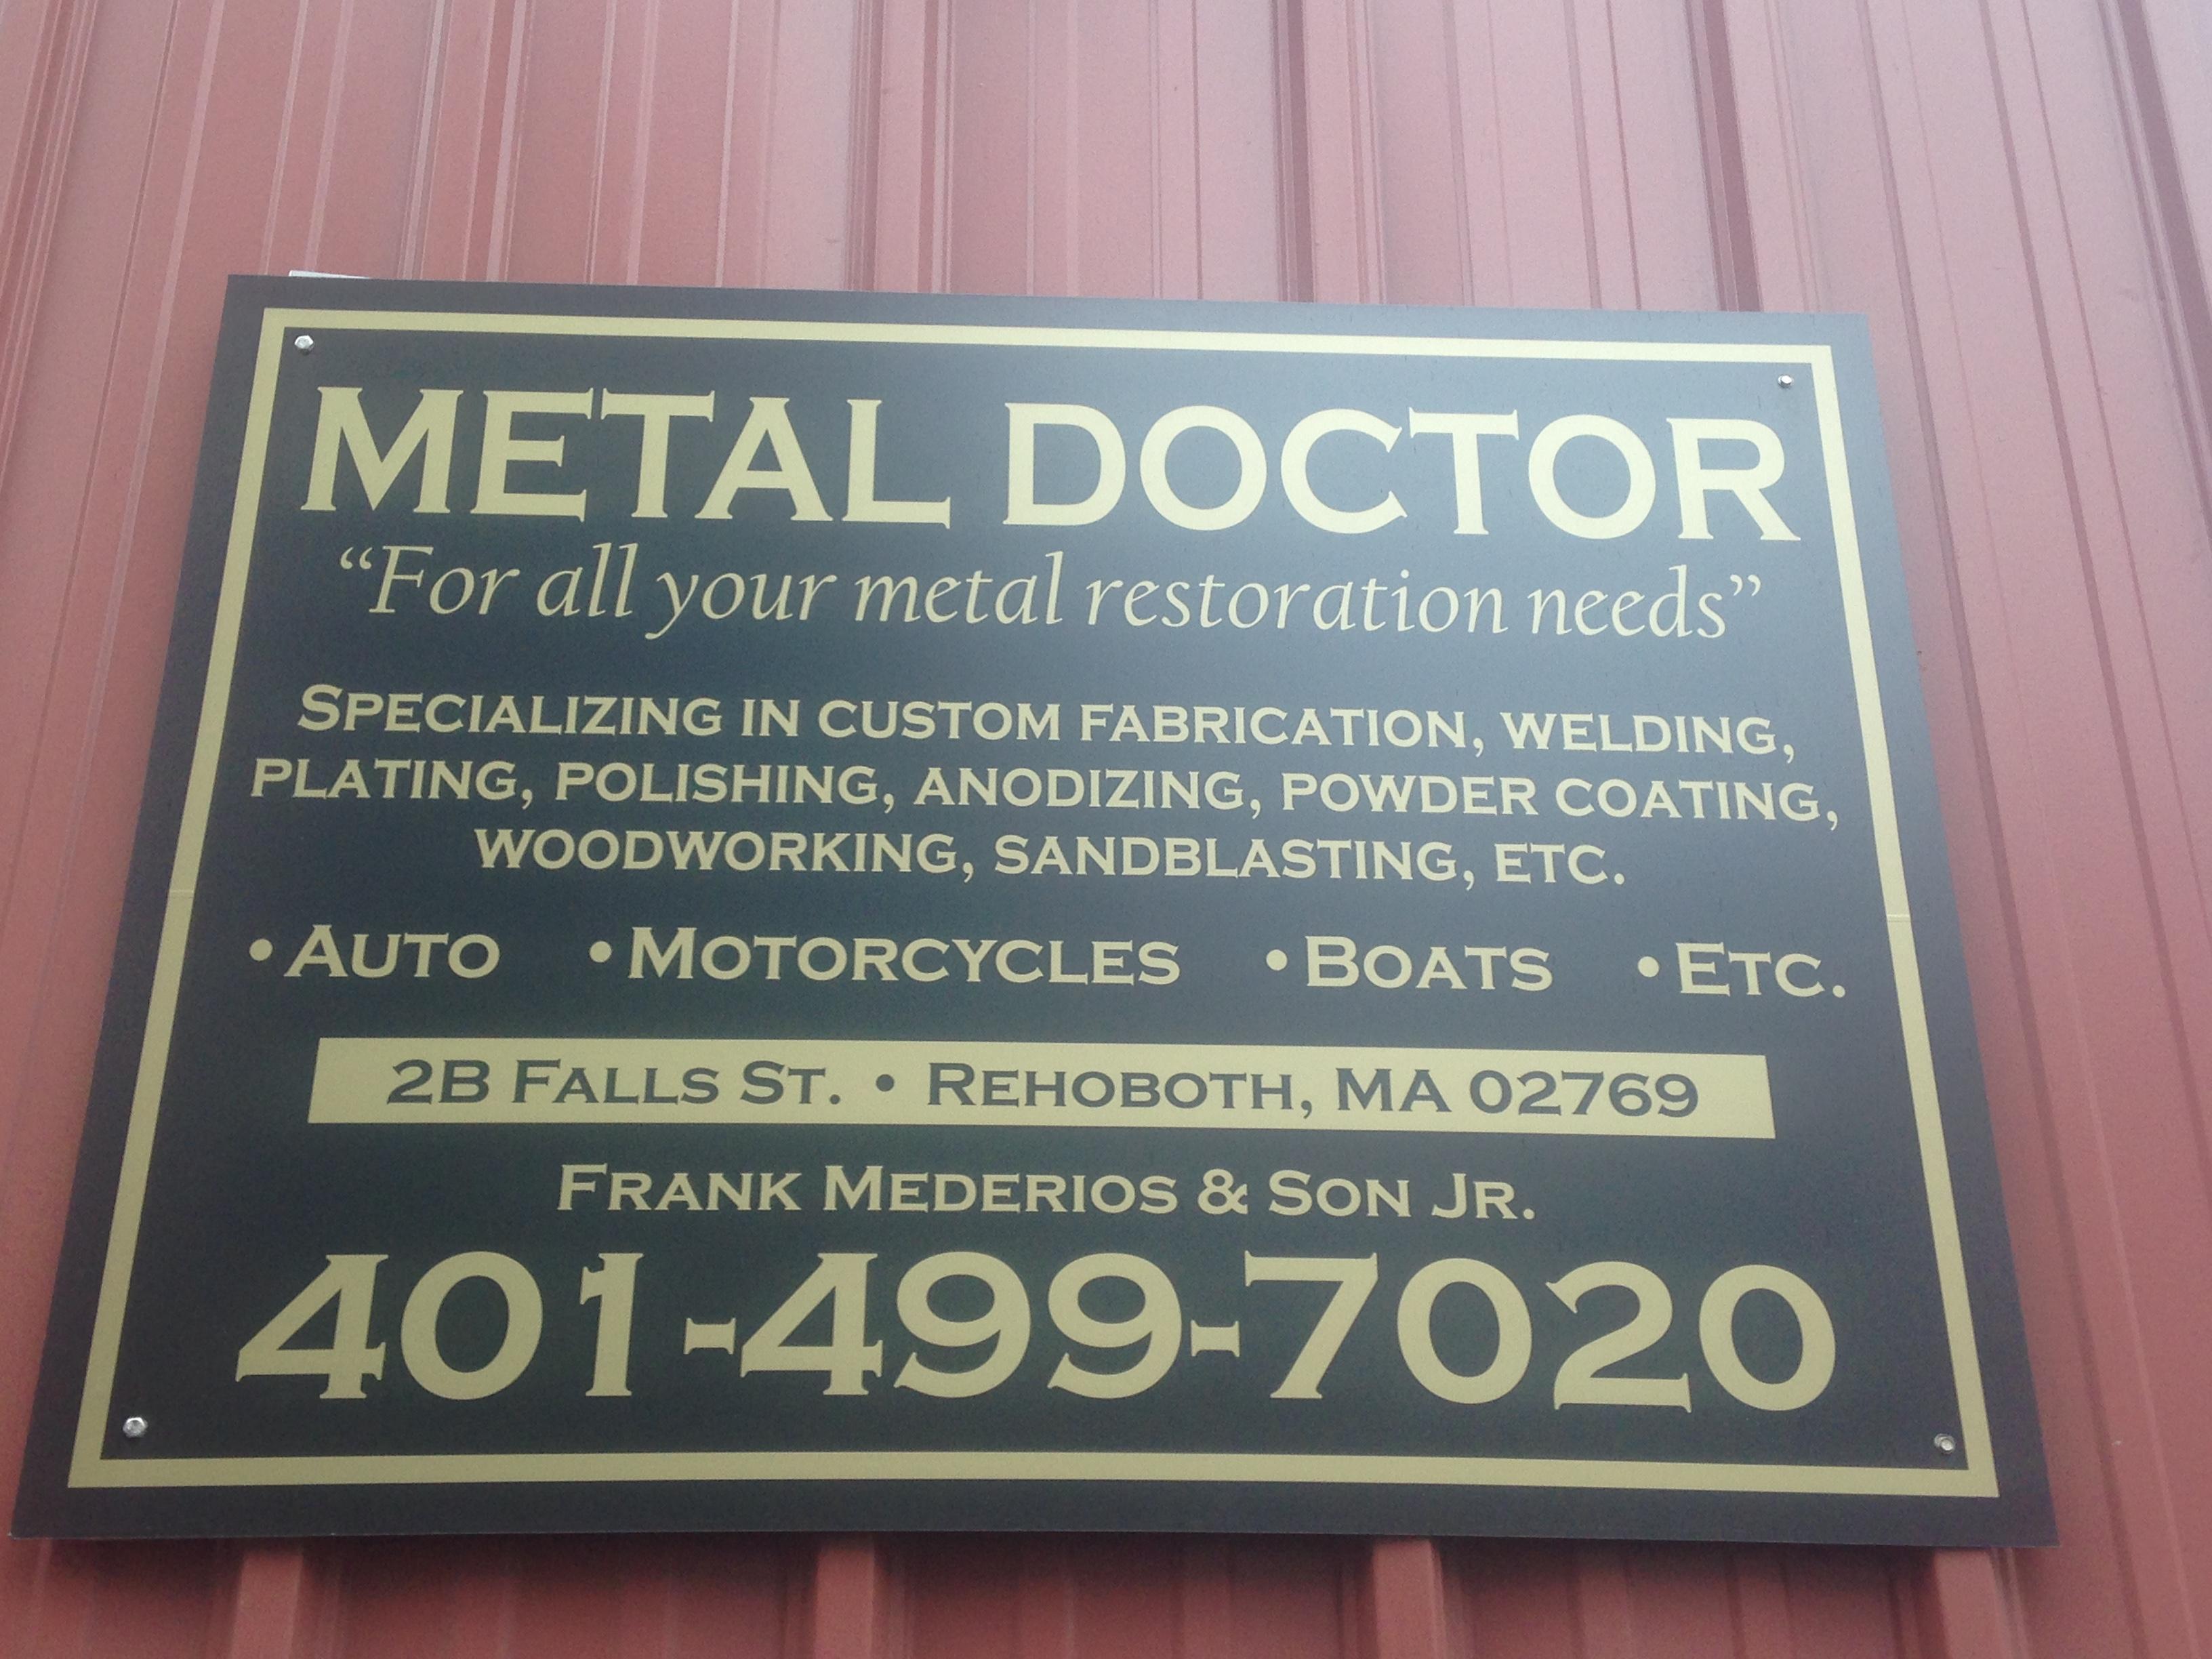 Metal Doctor 6b Falls St, Rehoboth, MA 06769 - YP.com